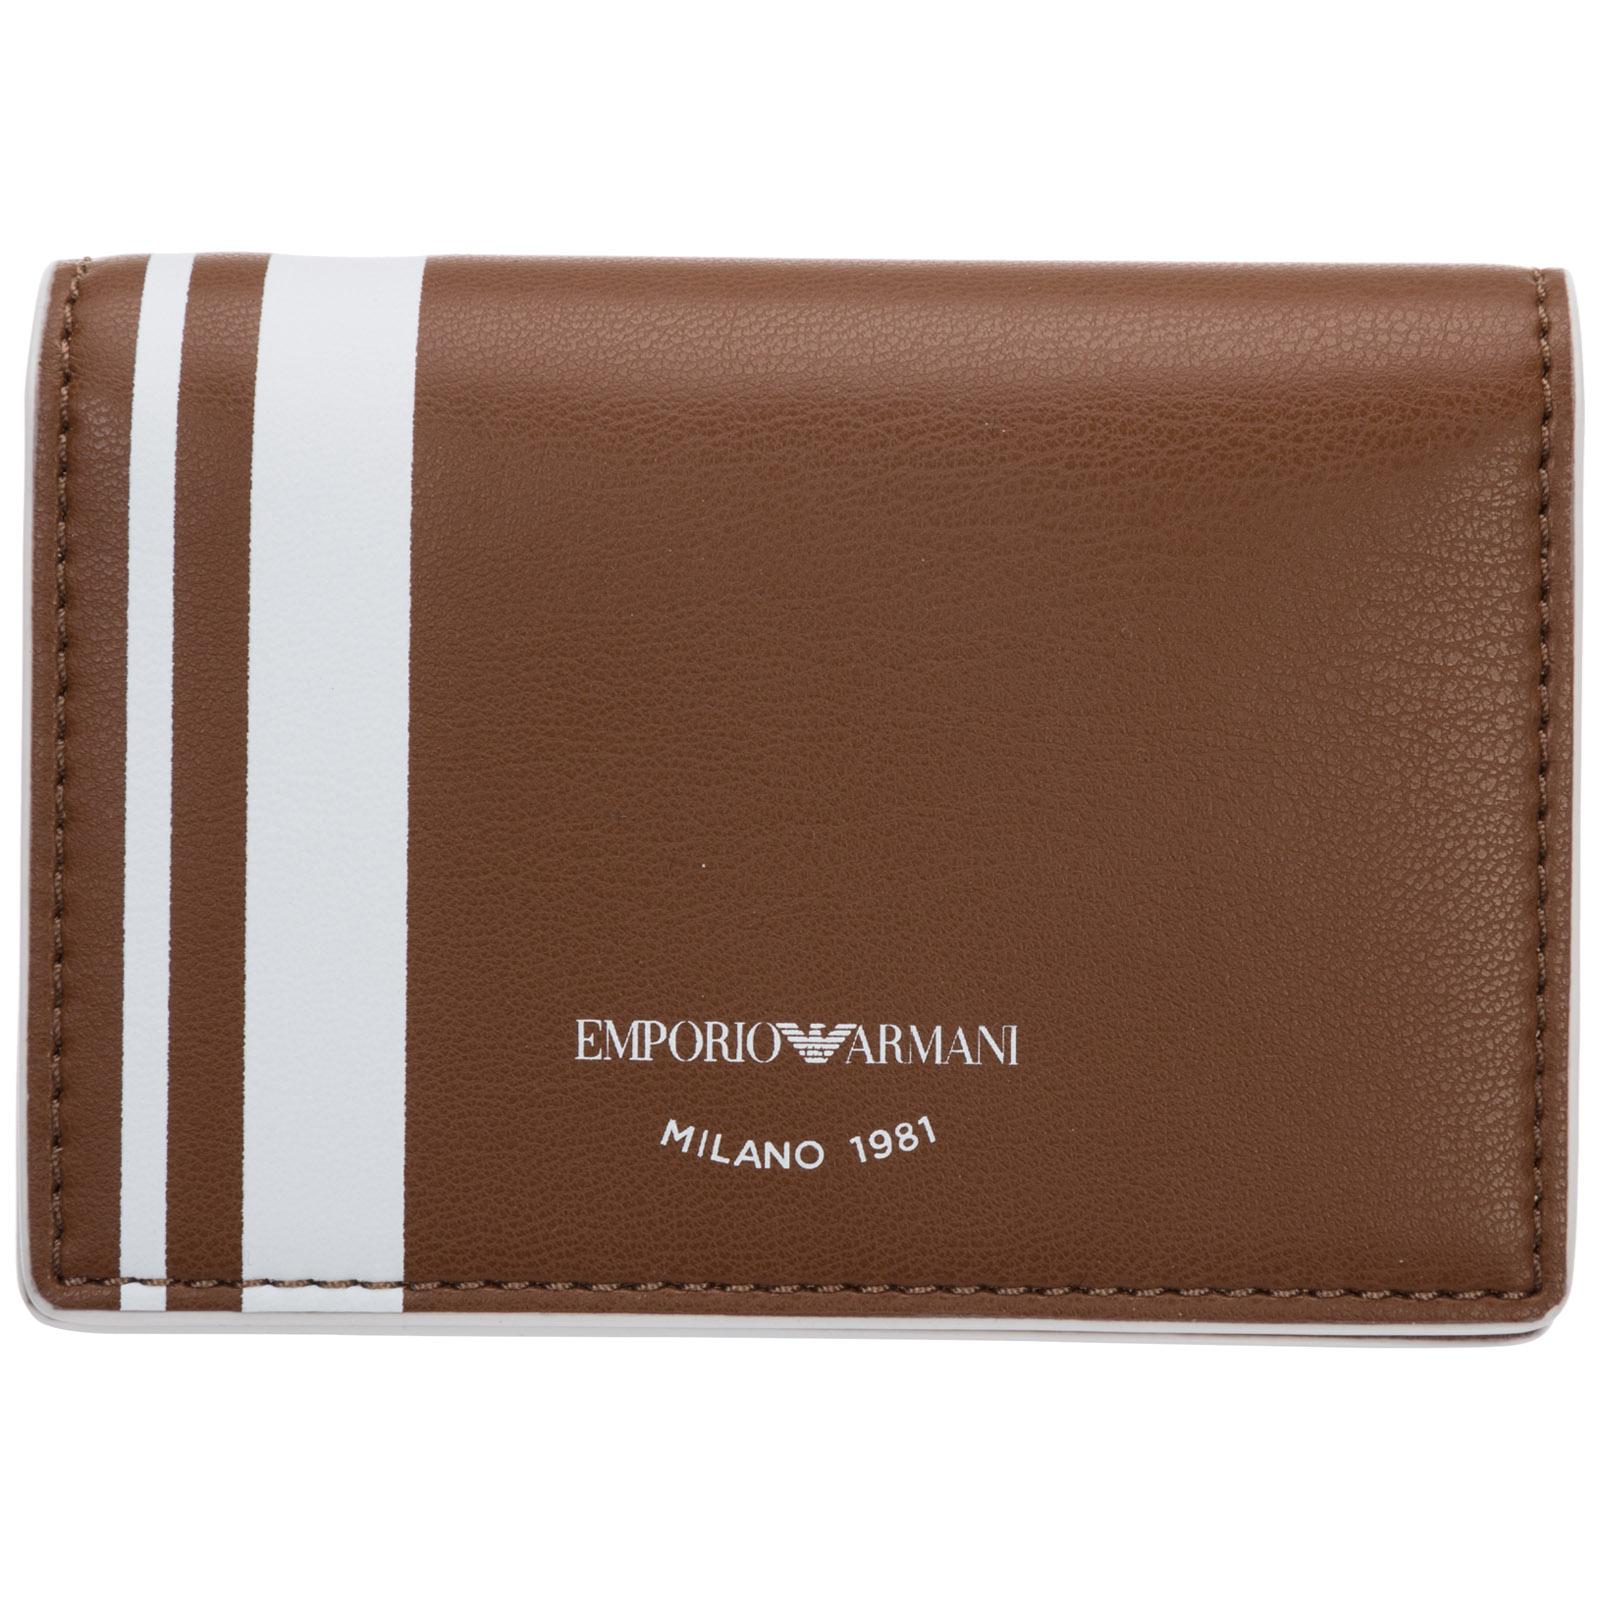 Emporio Armani WOMEN'S CREDIT CARD CASE HOLDER WALLET